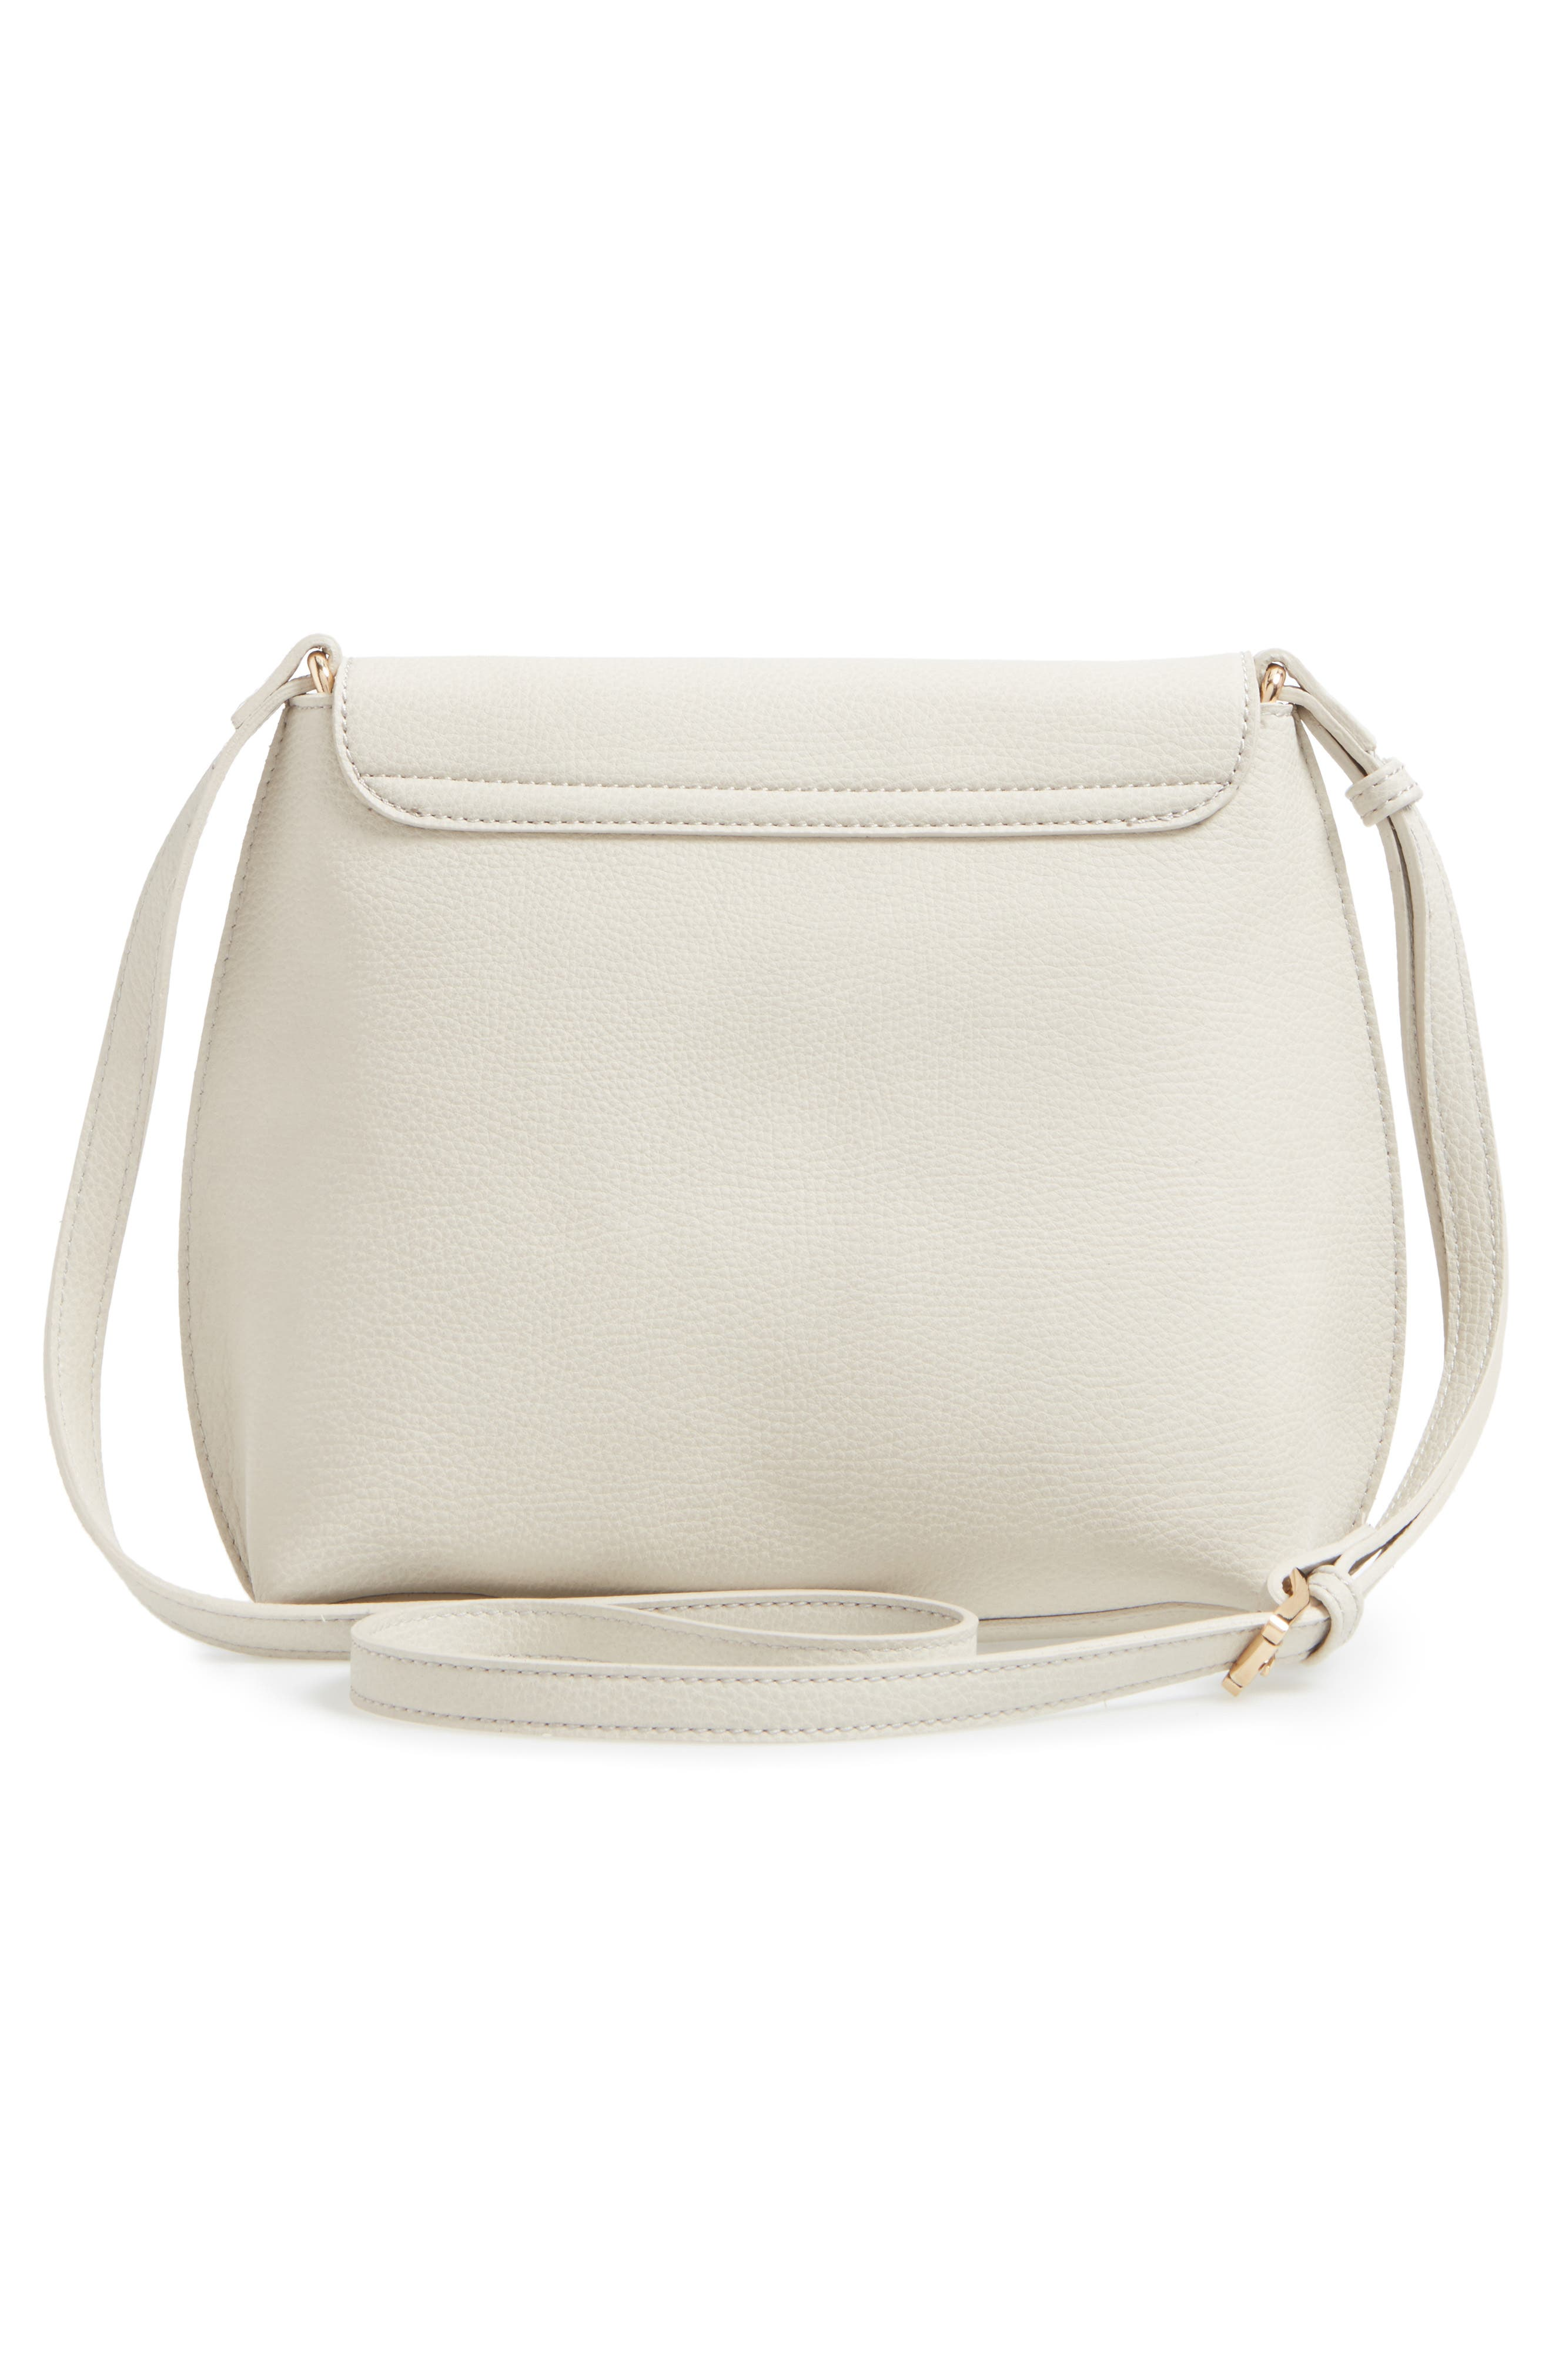 Alternate Image 3  - Sole Society Tassel Faux Leather Crossbody Bag